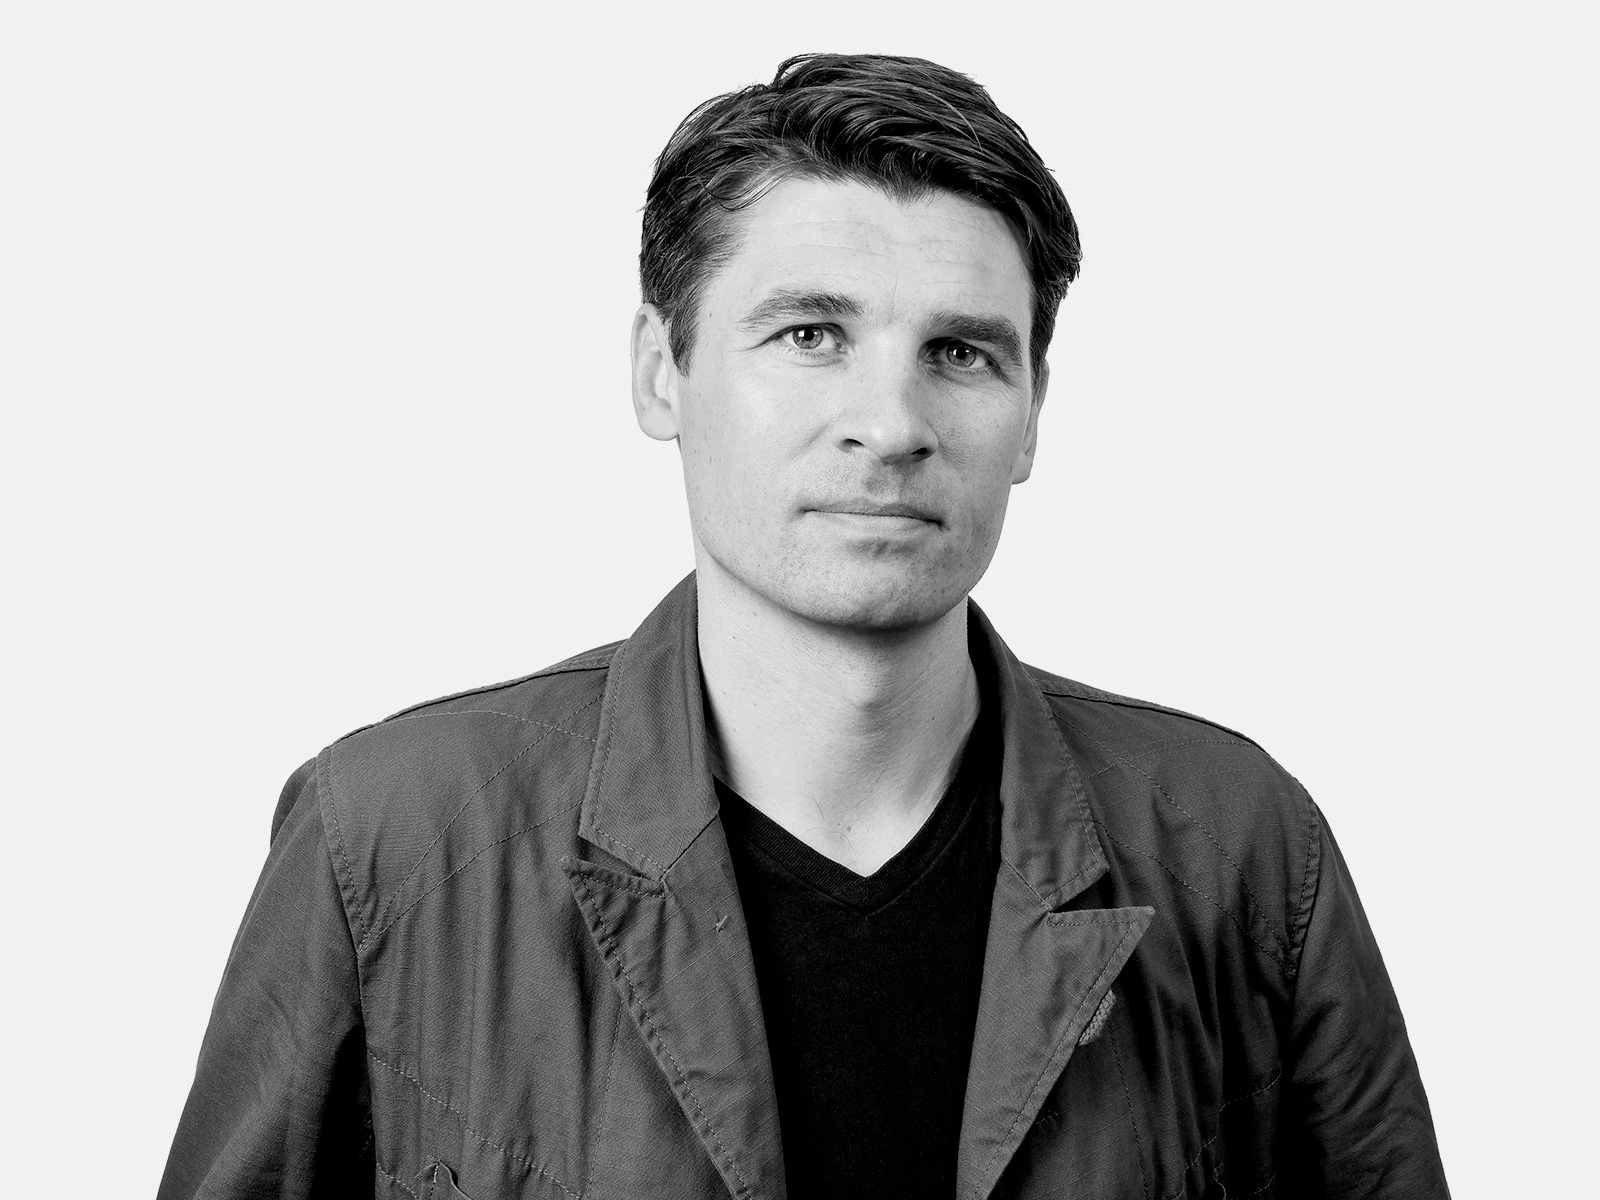 Portrait of Design Director Troels Faber